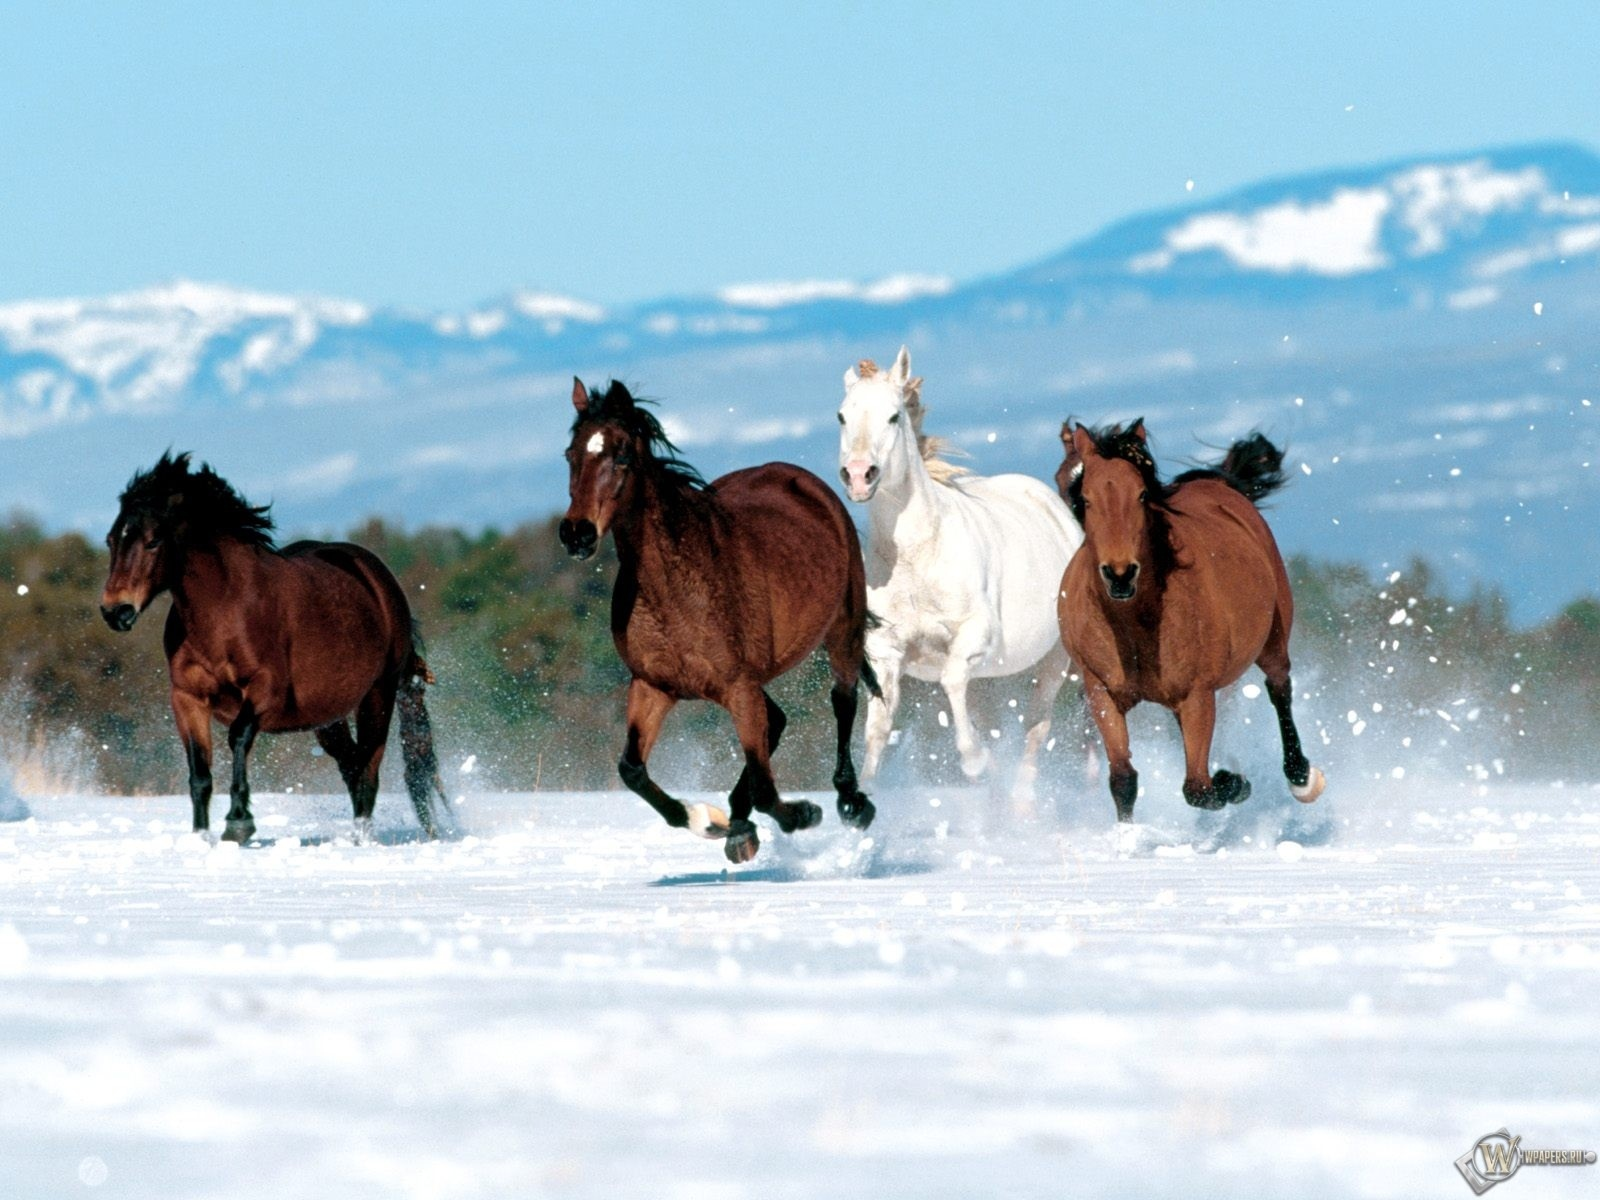 Четыре коня бегут по снегу 1600x1200